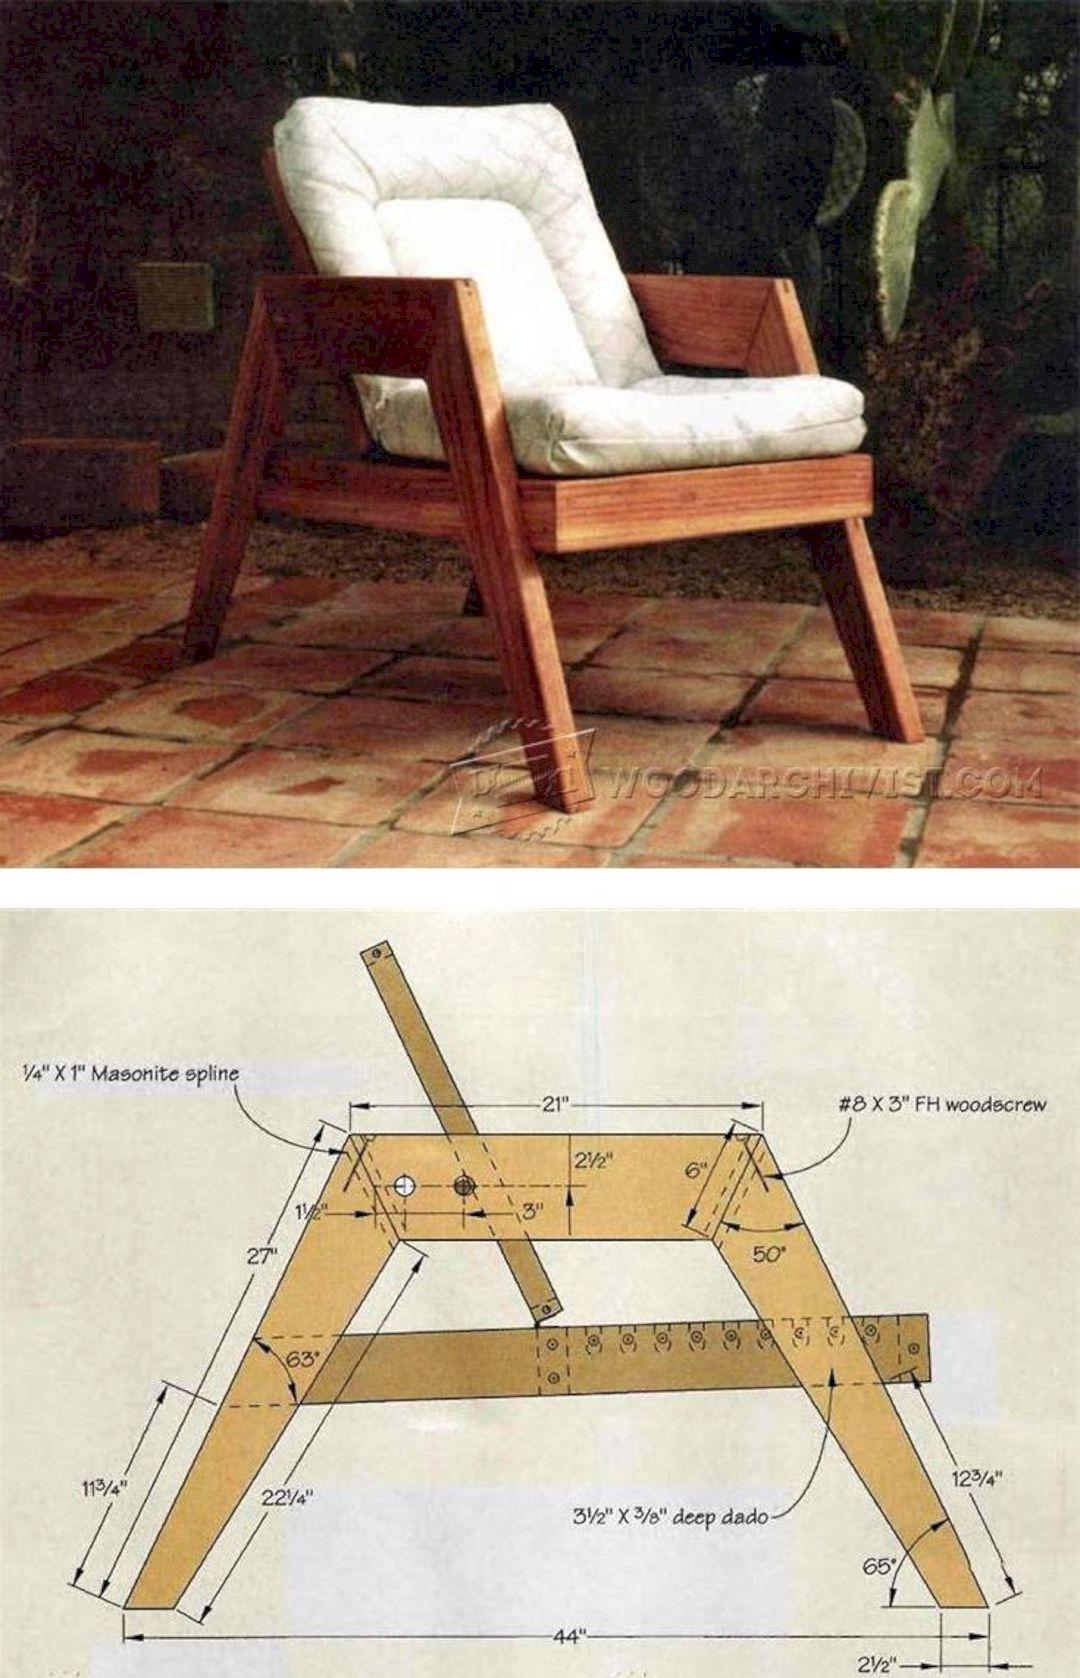 12 Inspirations Of Easy Diy Furniture Hacks For Your Home Interior Diy Furniture Hacks Diy Furniture Easy Diy Outdoor Furniture